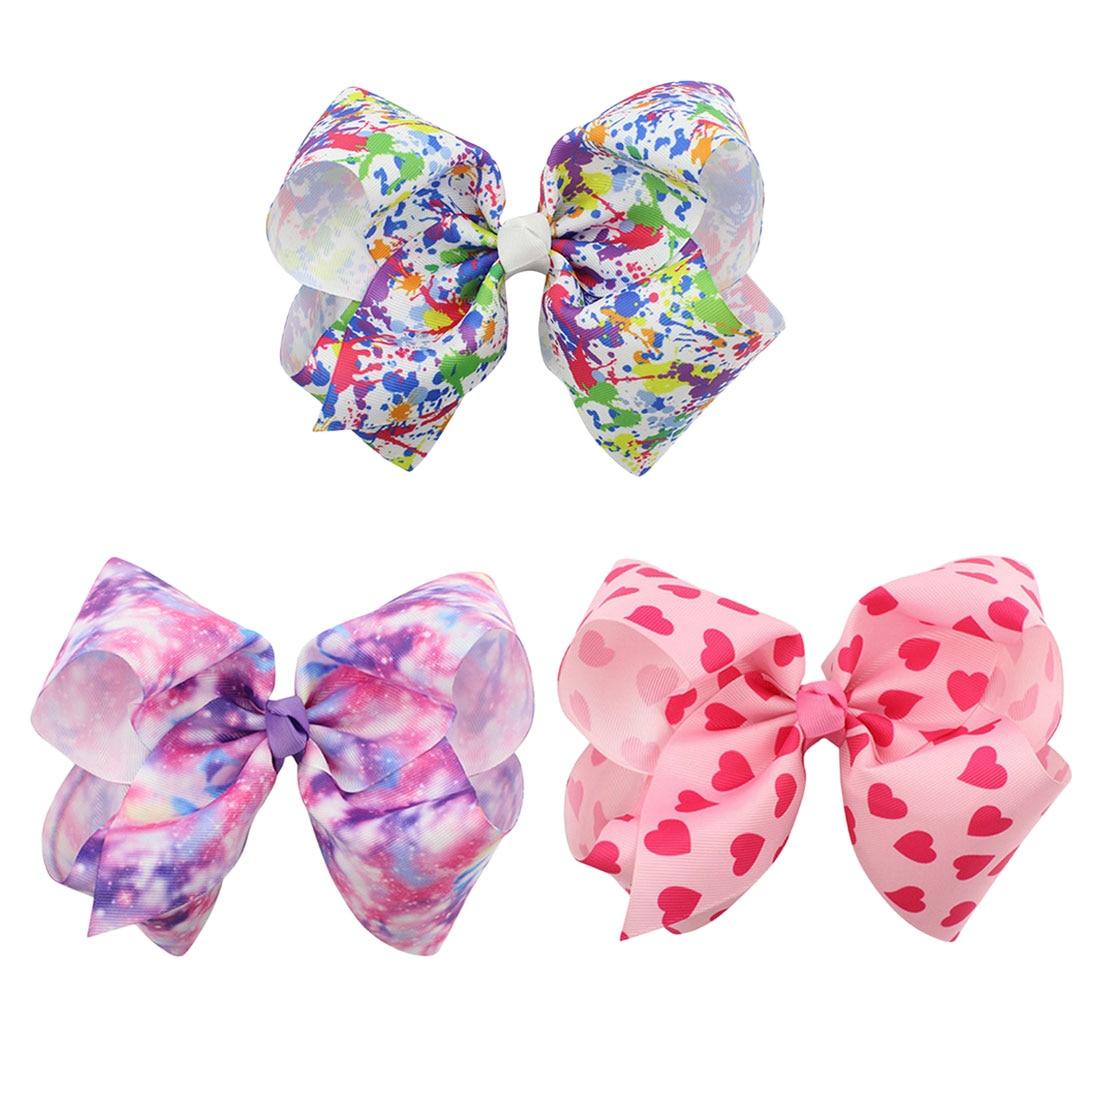 Hair Bows Graffiti Ribbon  Handmade Hairgrips Kids Bow Clips Fashion Accessories for Girls big bow